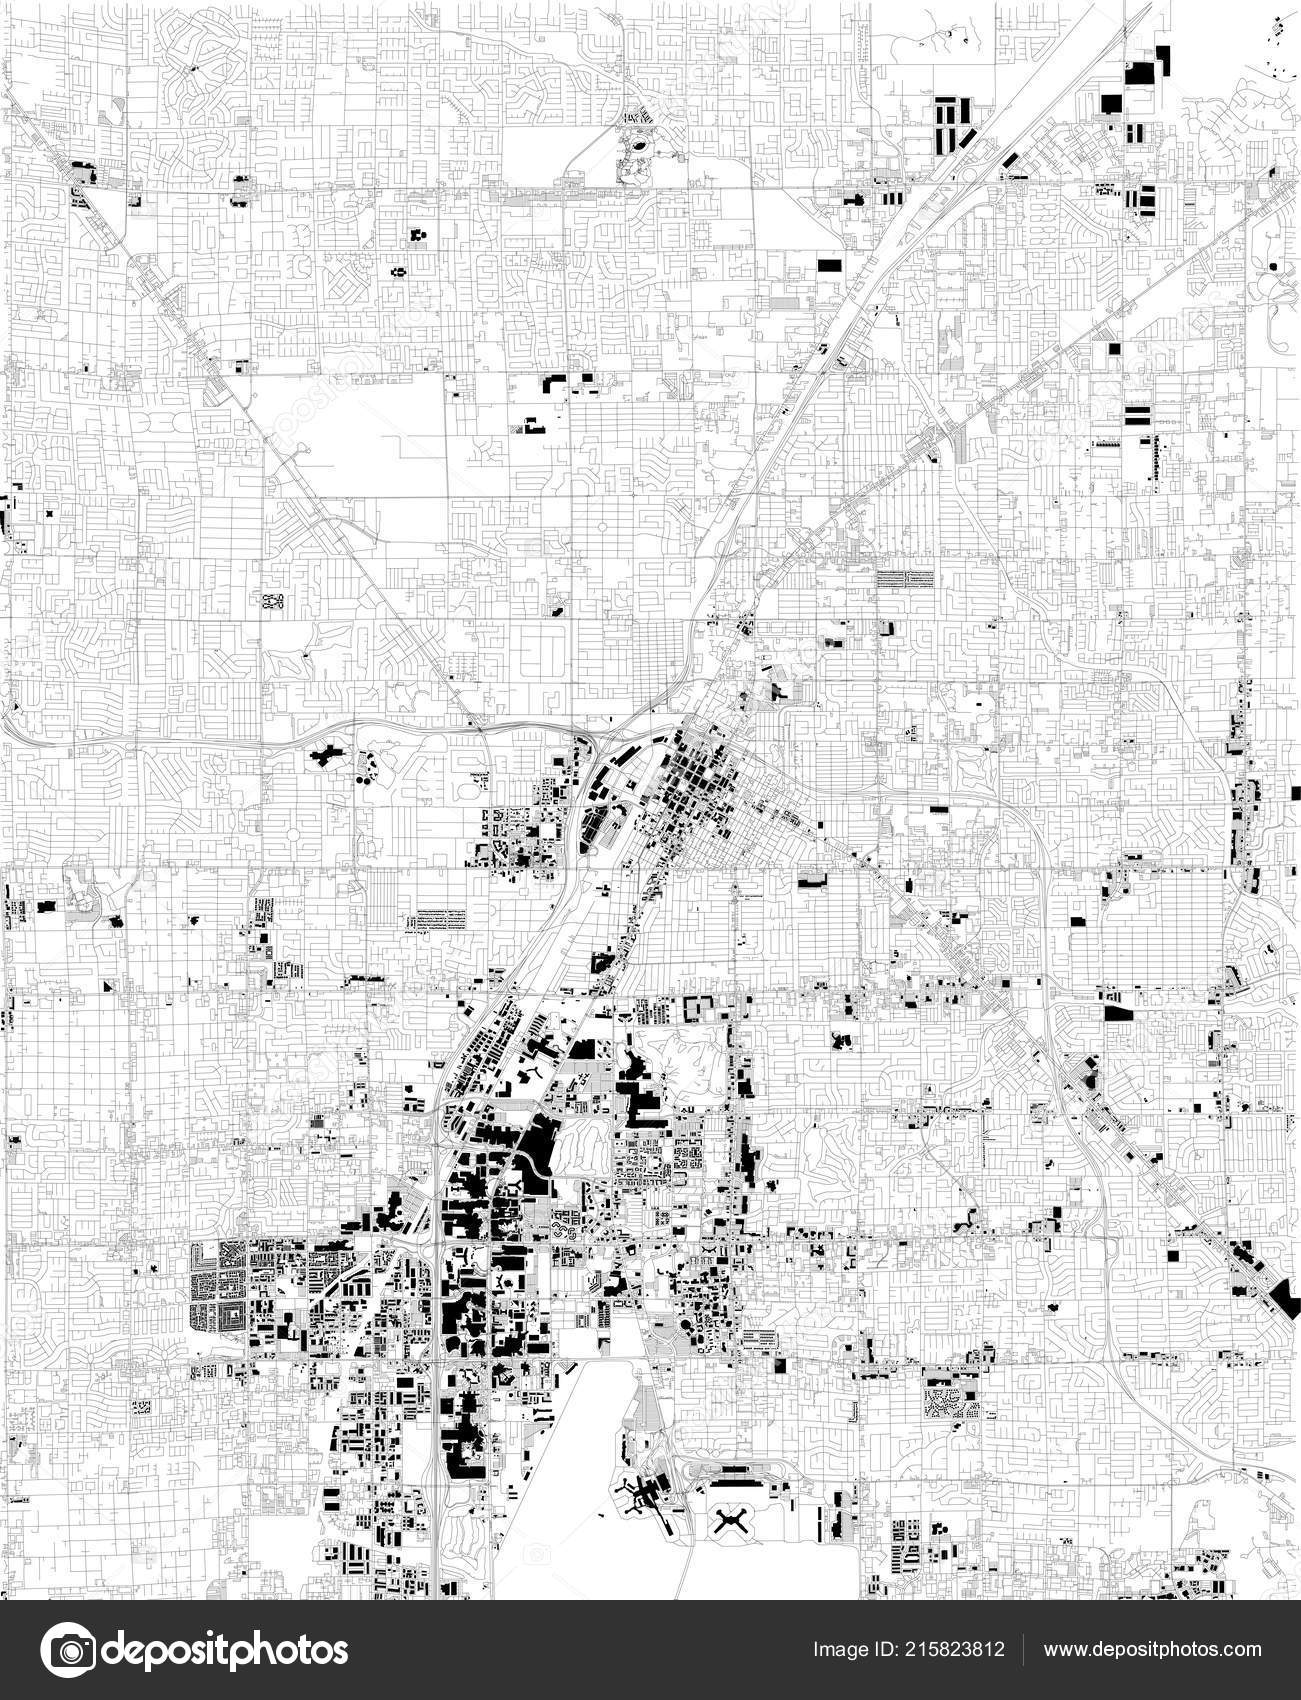 Map Las Vegas Satellite View Black White Map Street ...